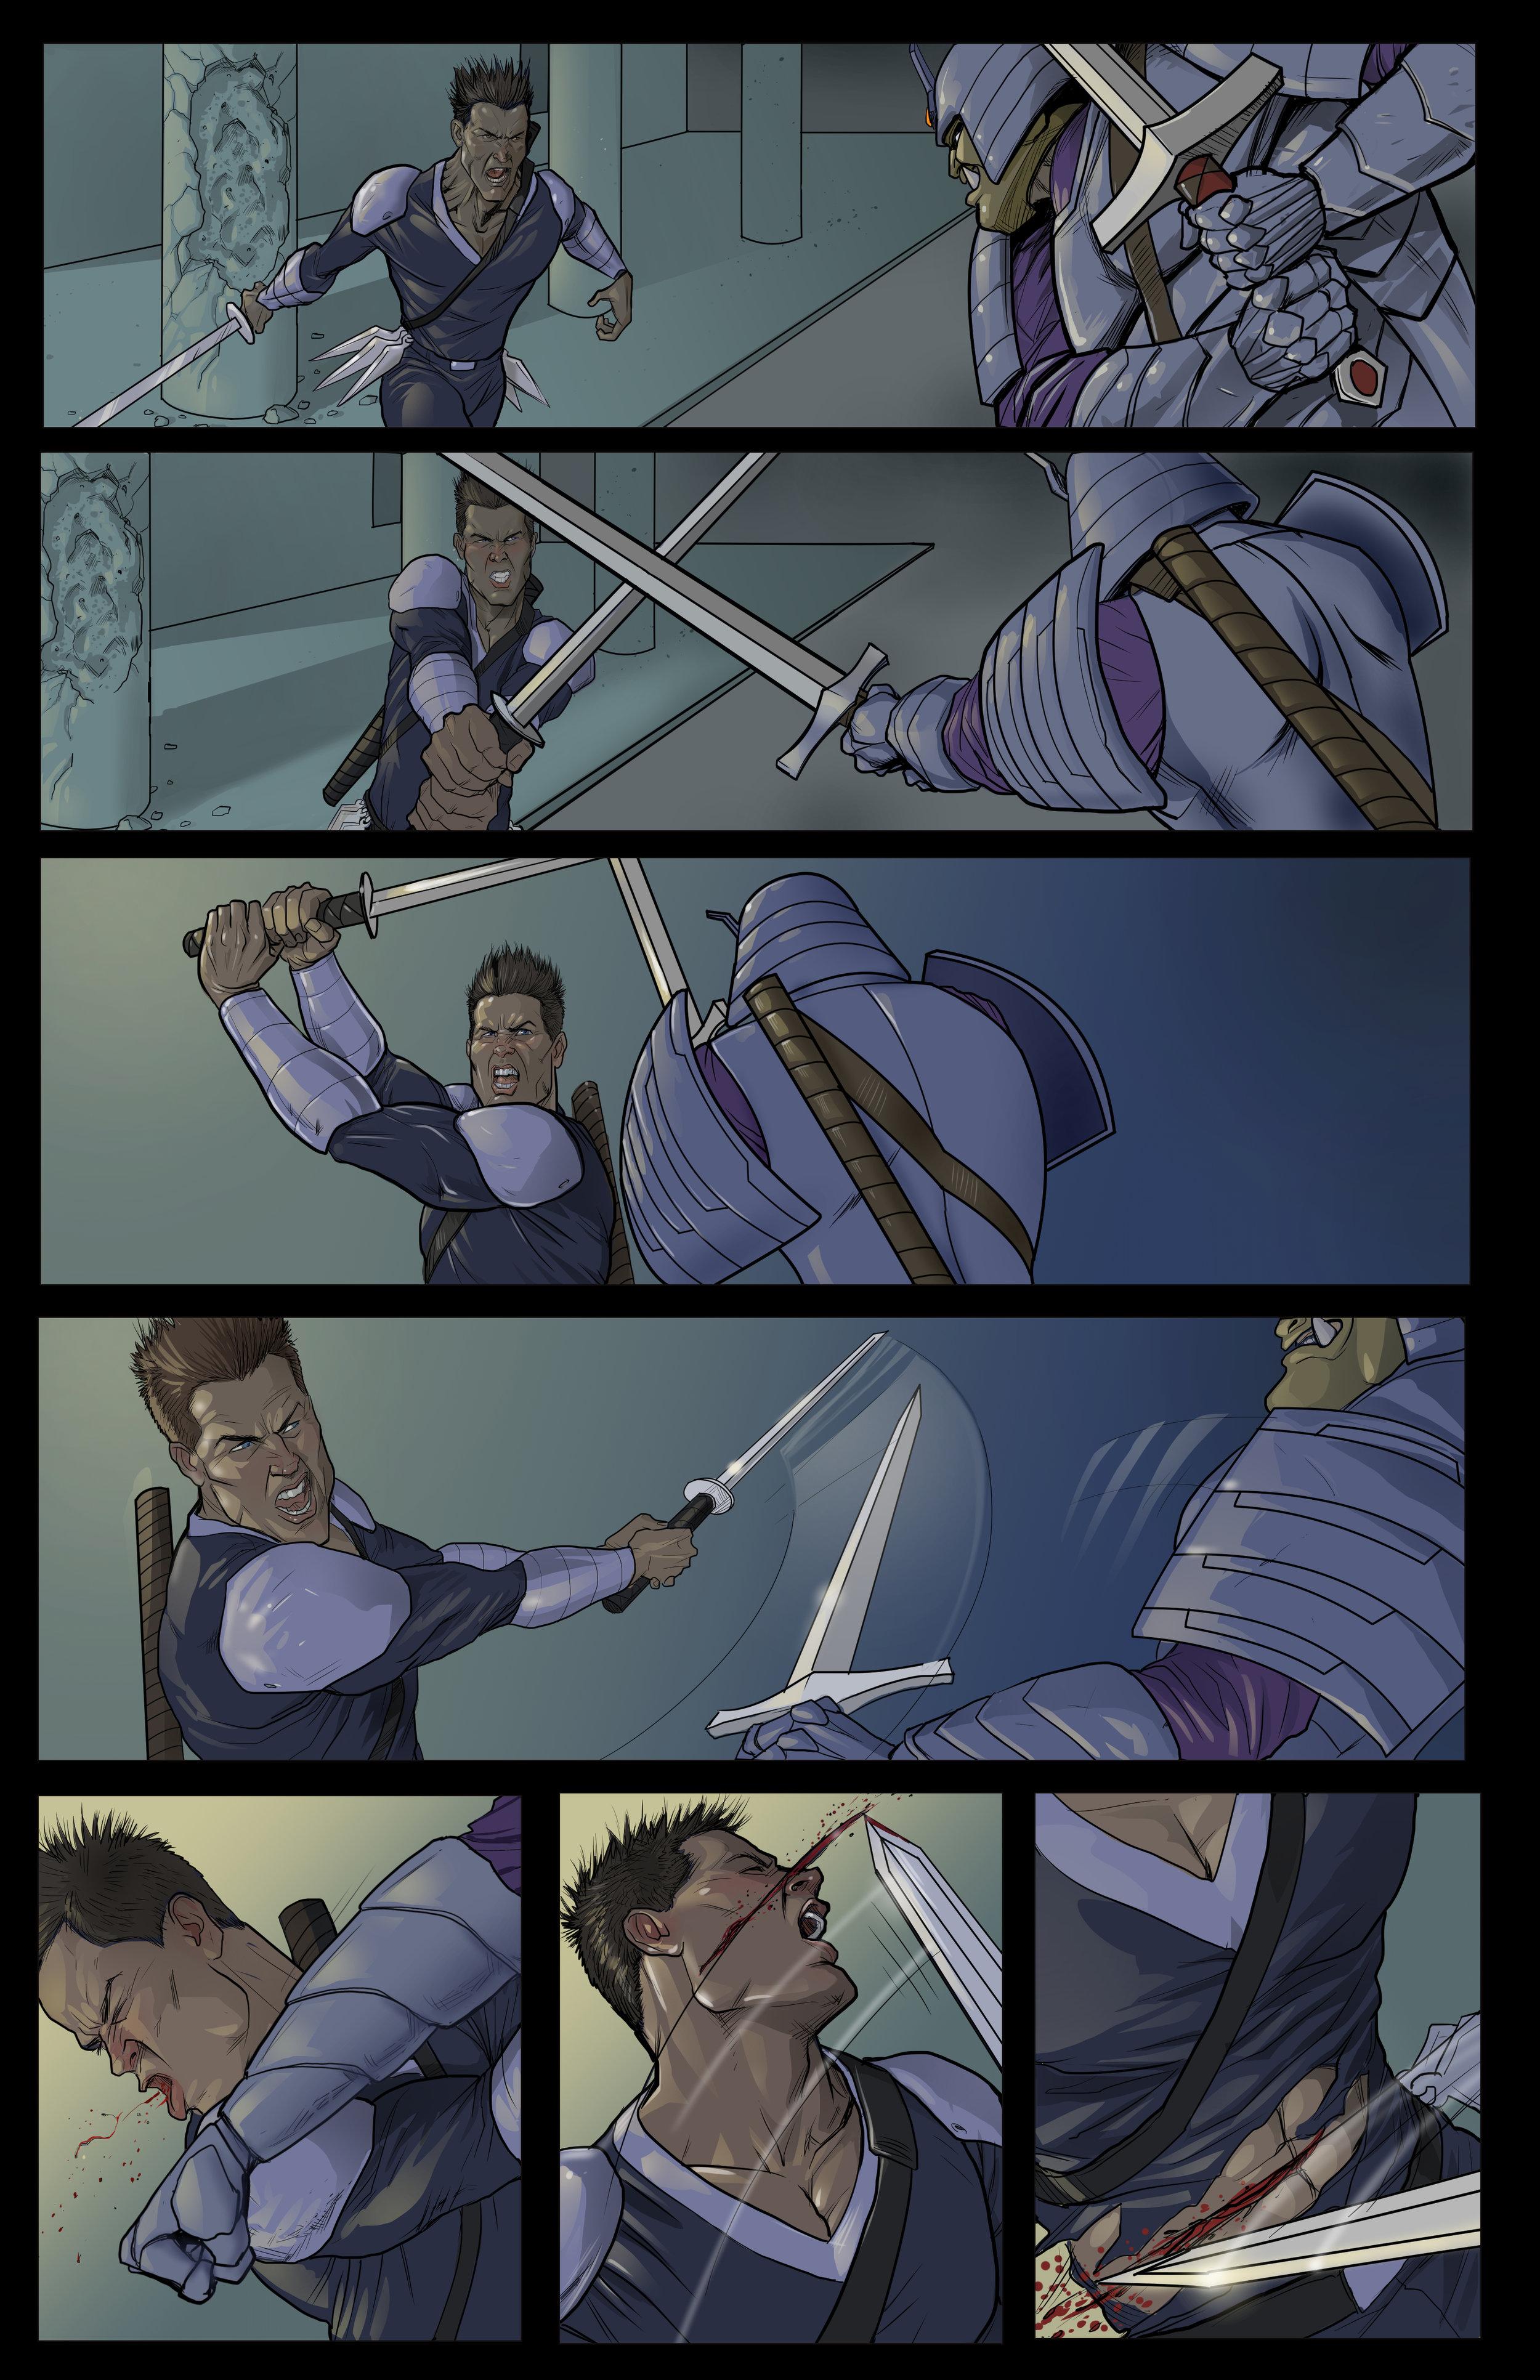 comic page 4 final (1).jpg